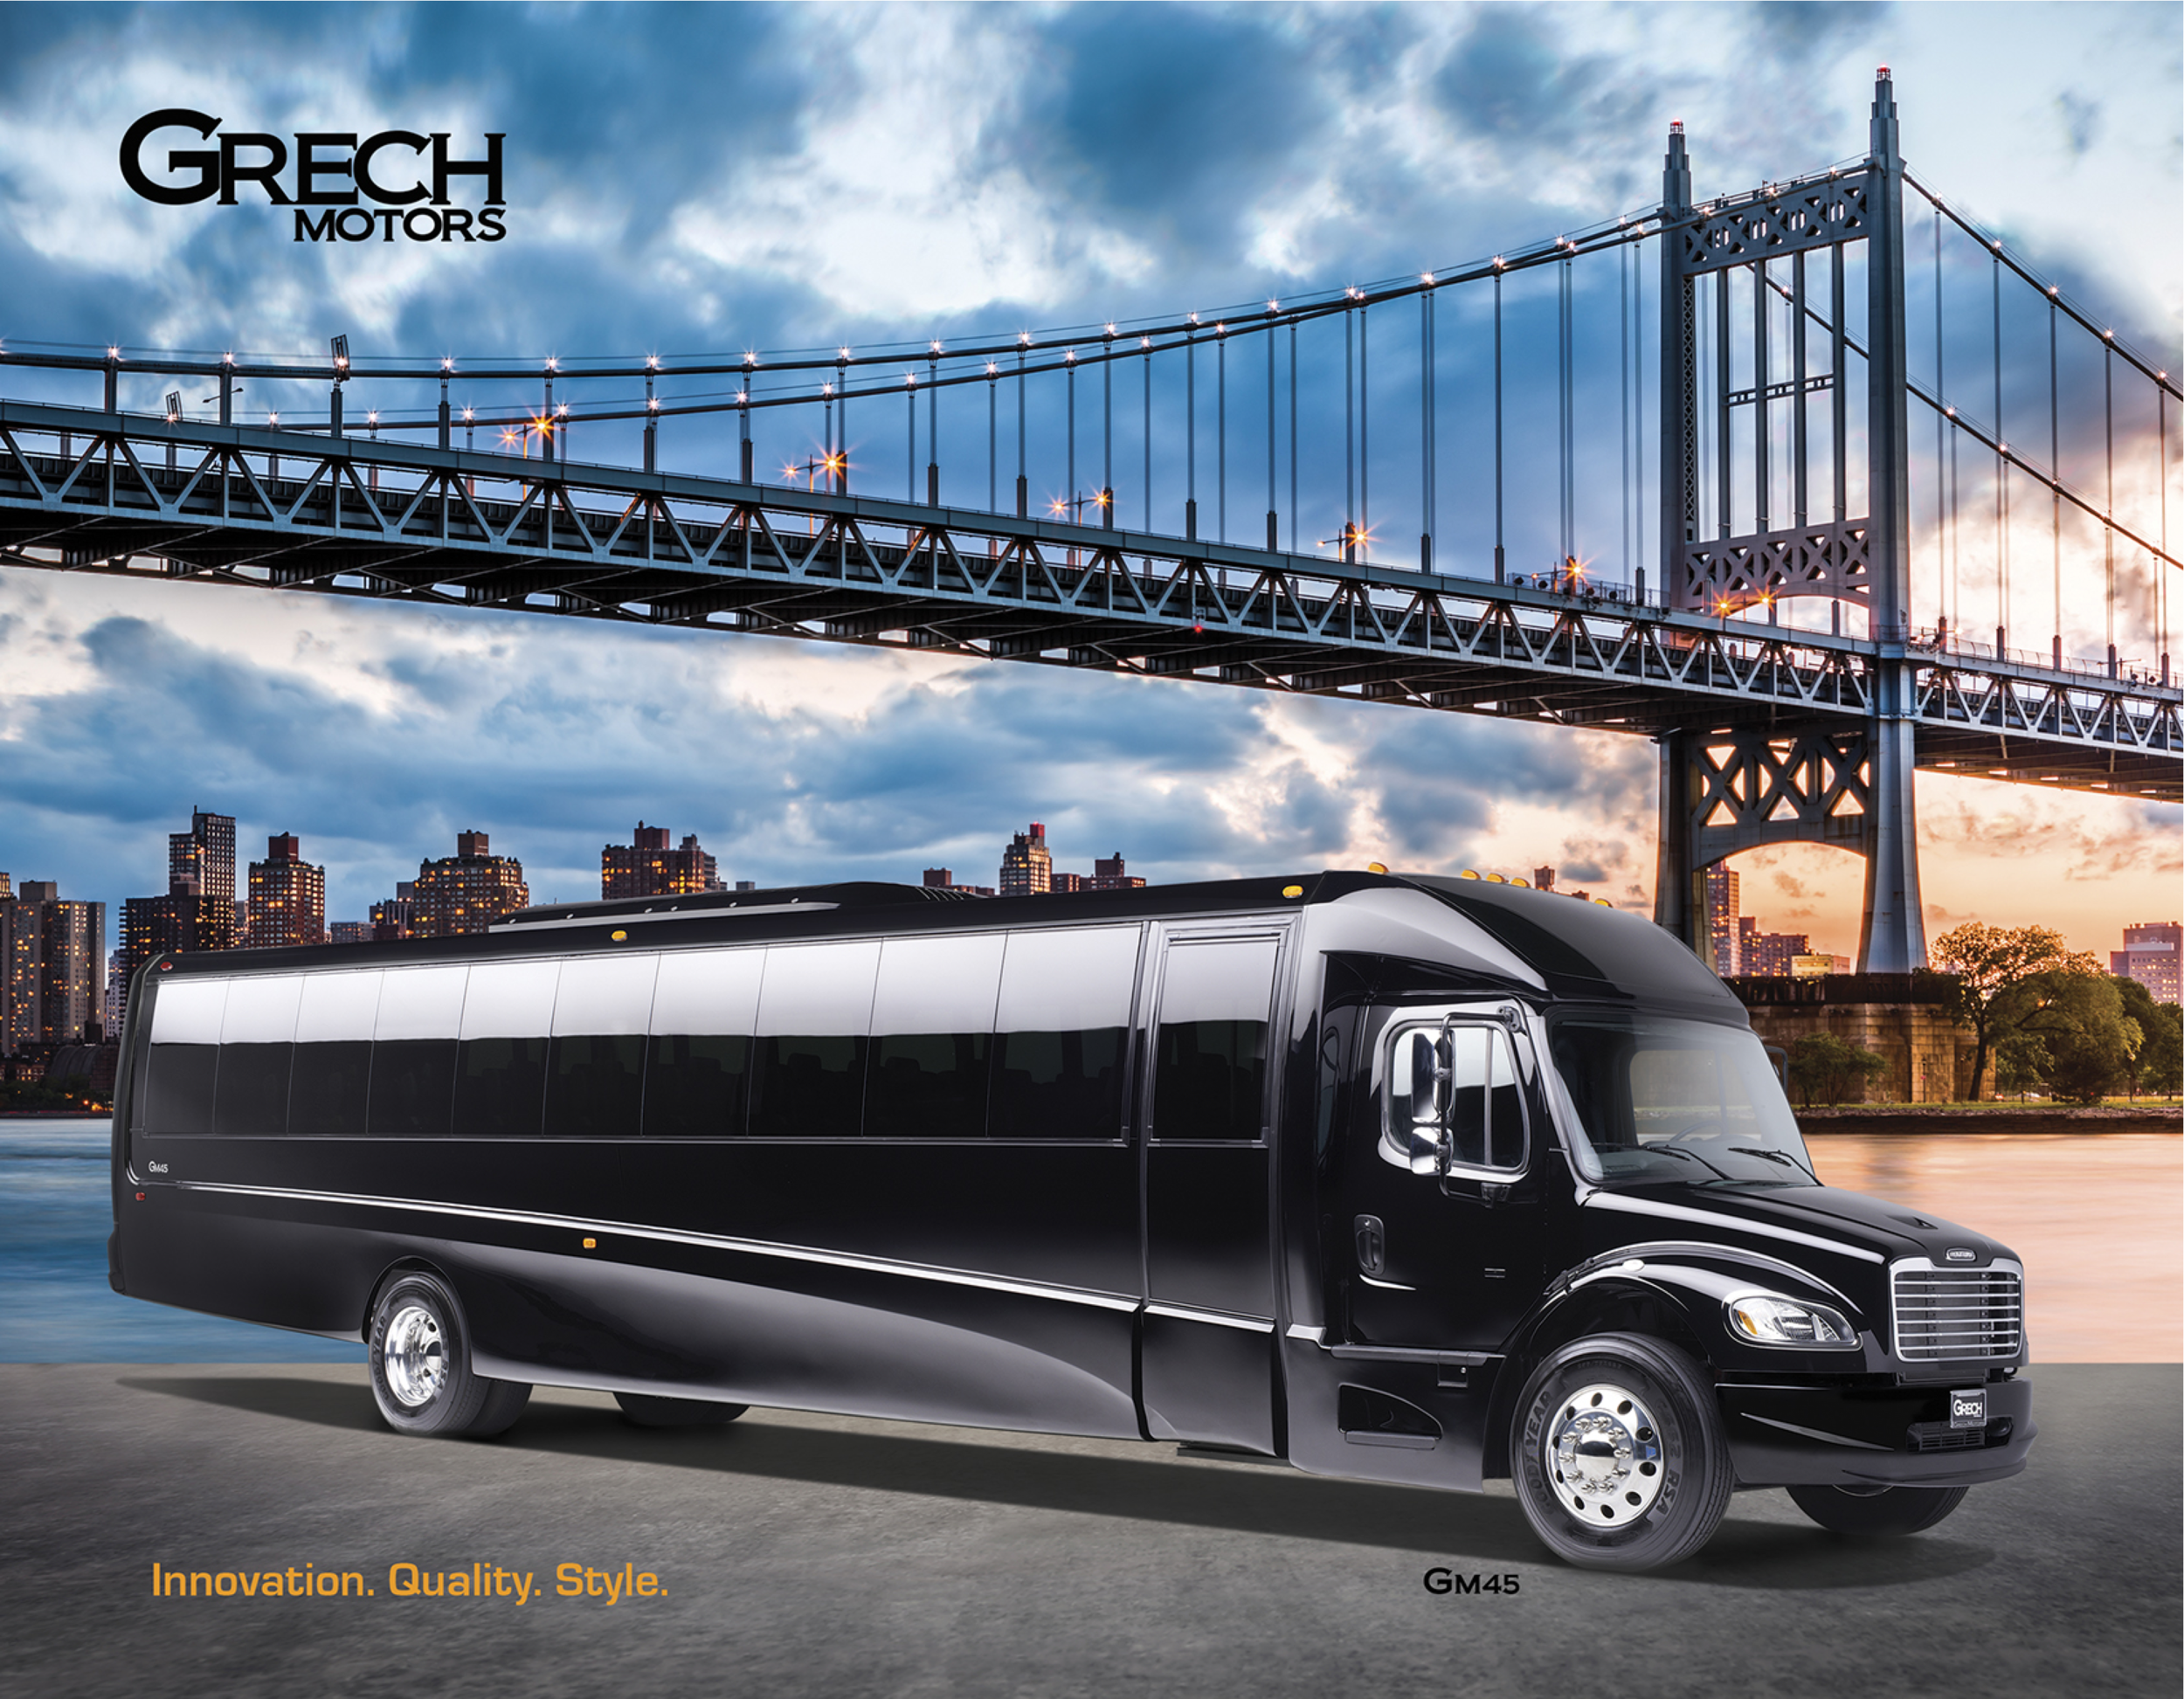 Grech Motors luxury bus brochure